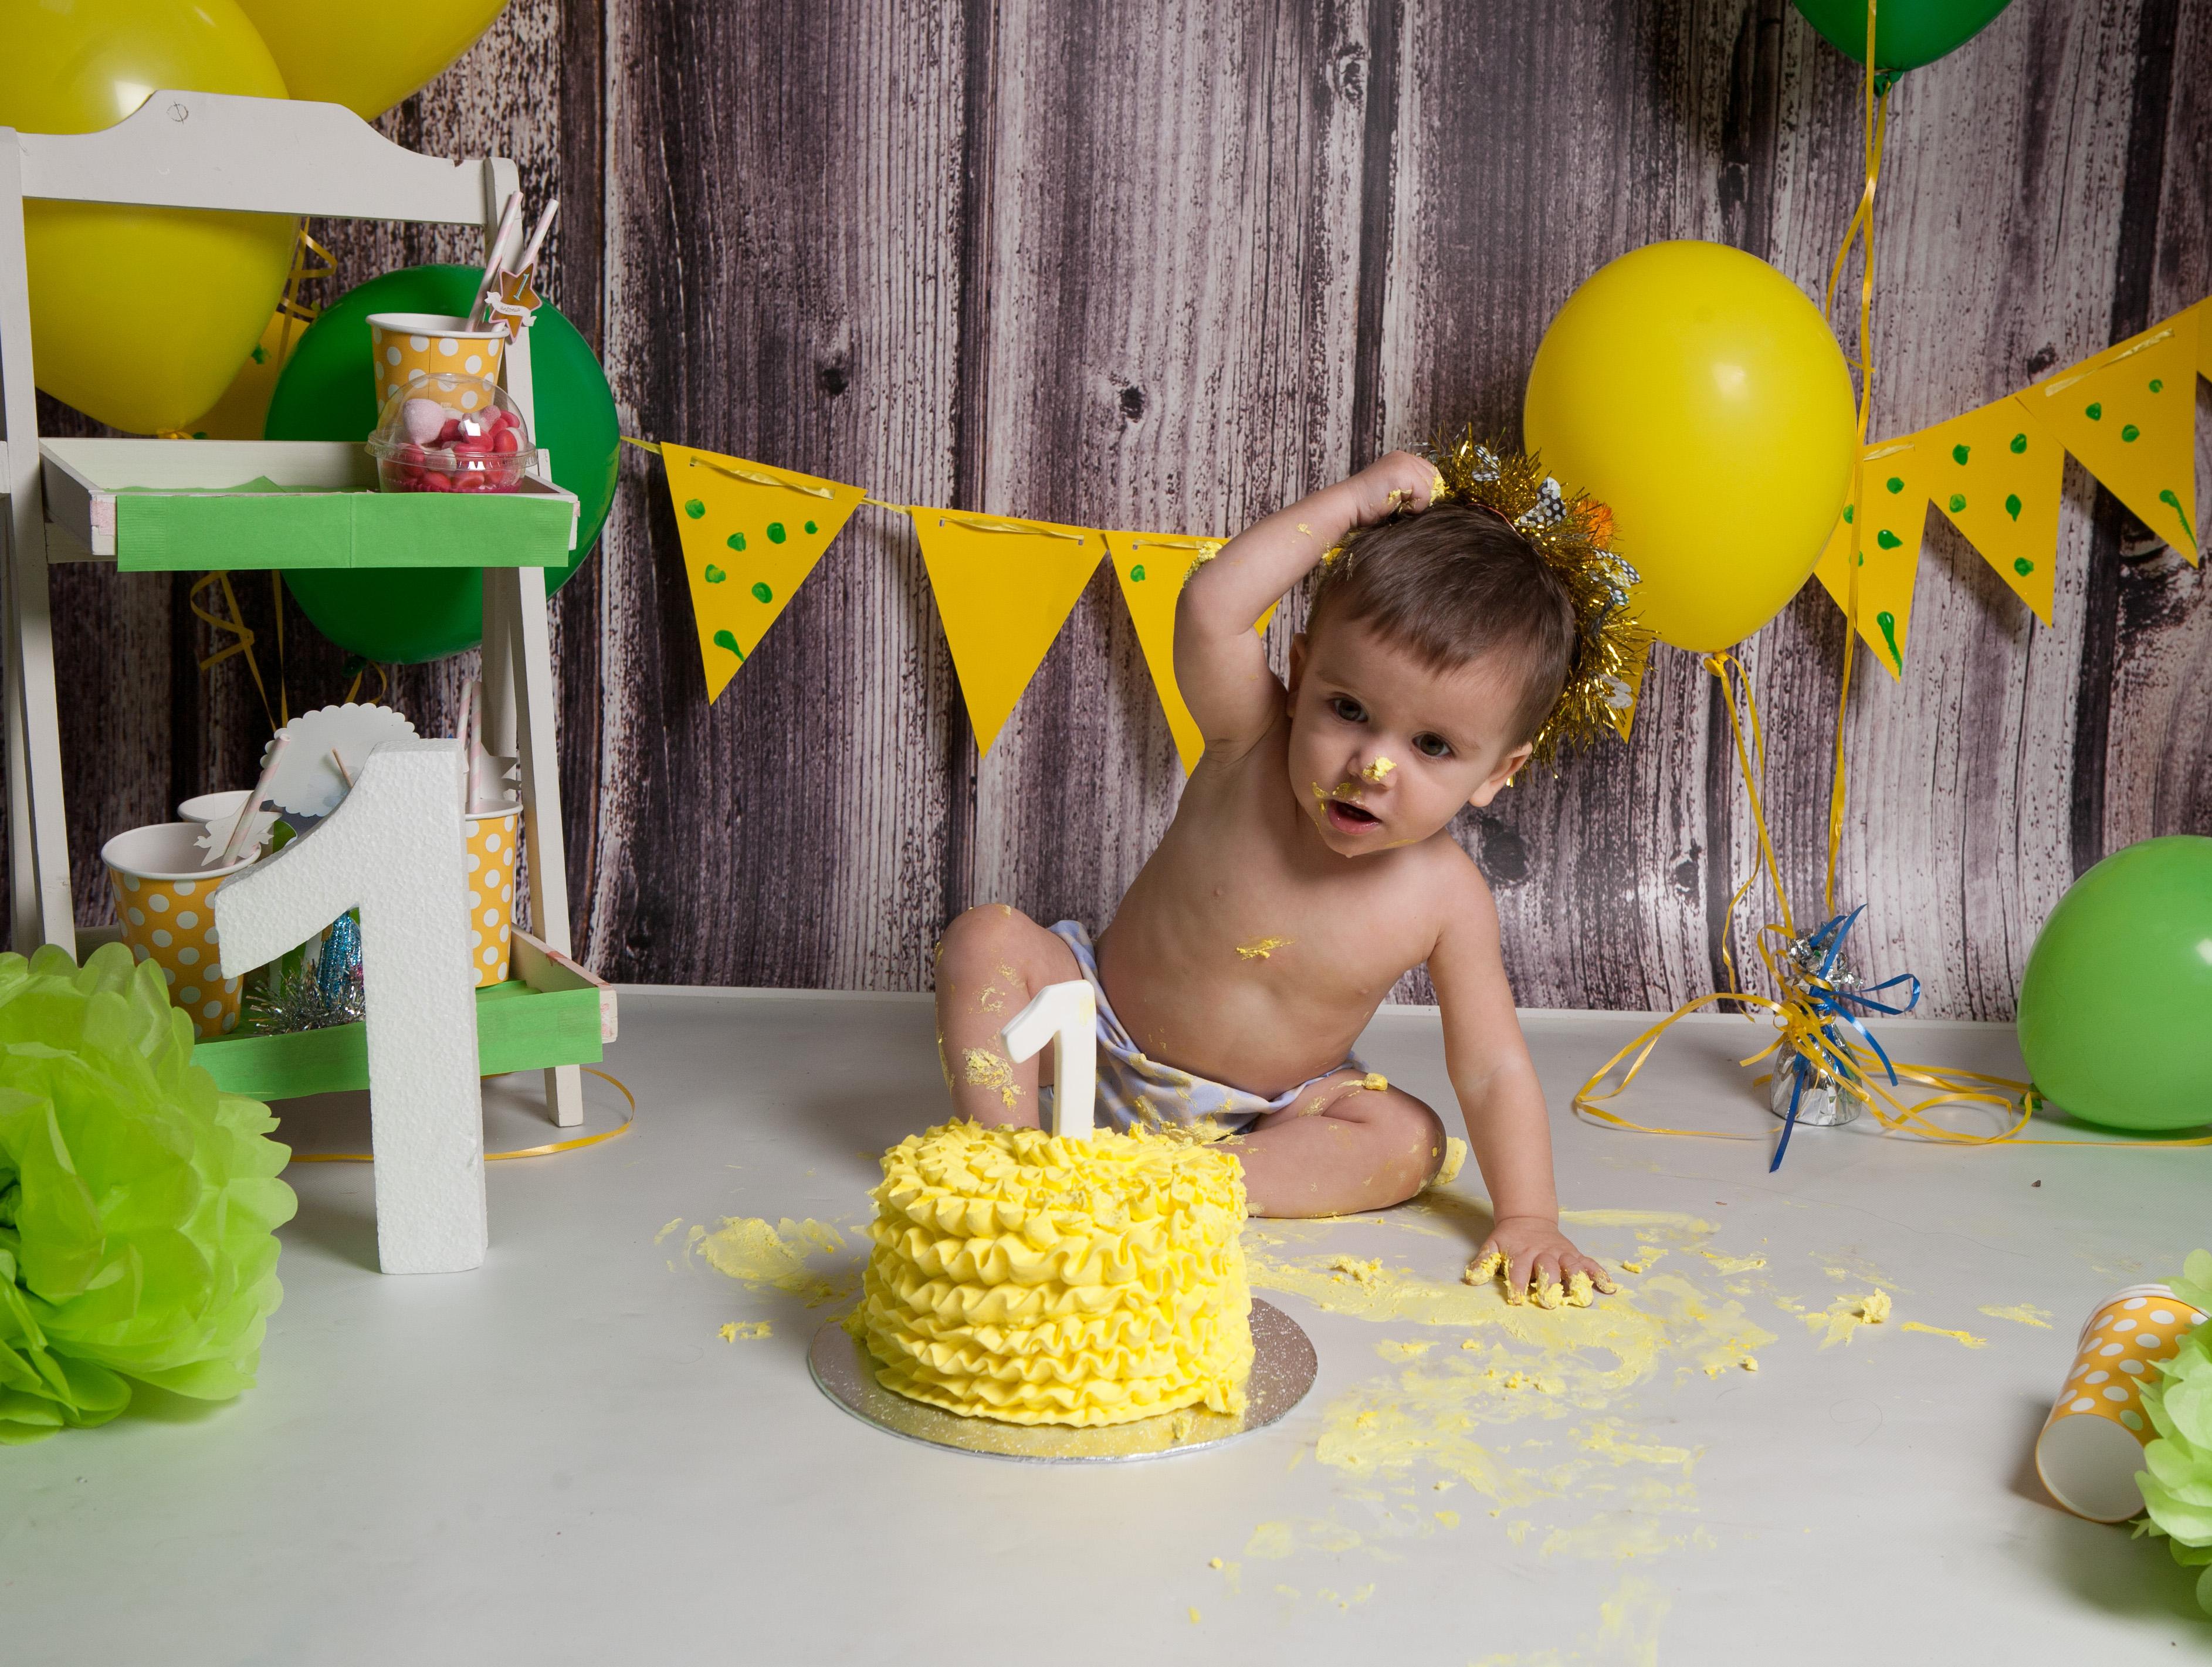 sesion-smash-cake-fuenlabrada-bjfotografia